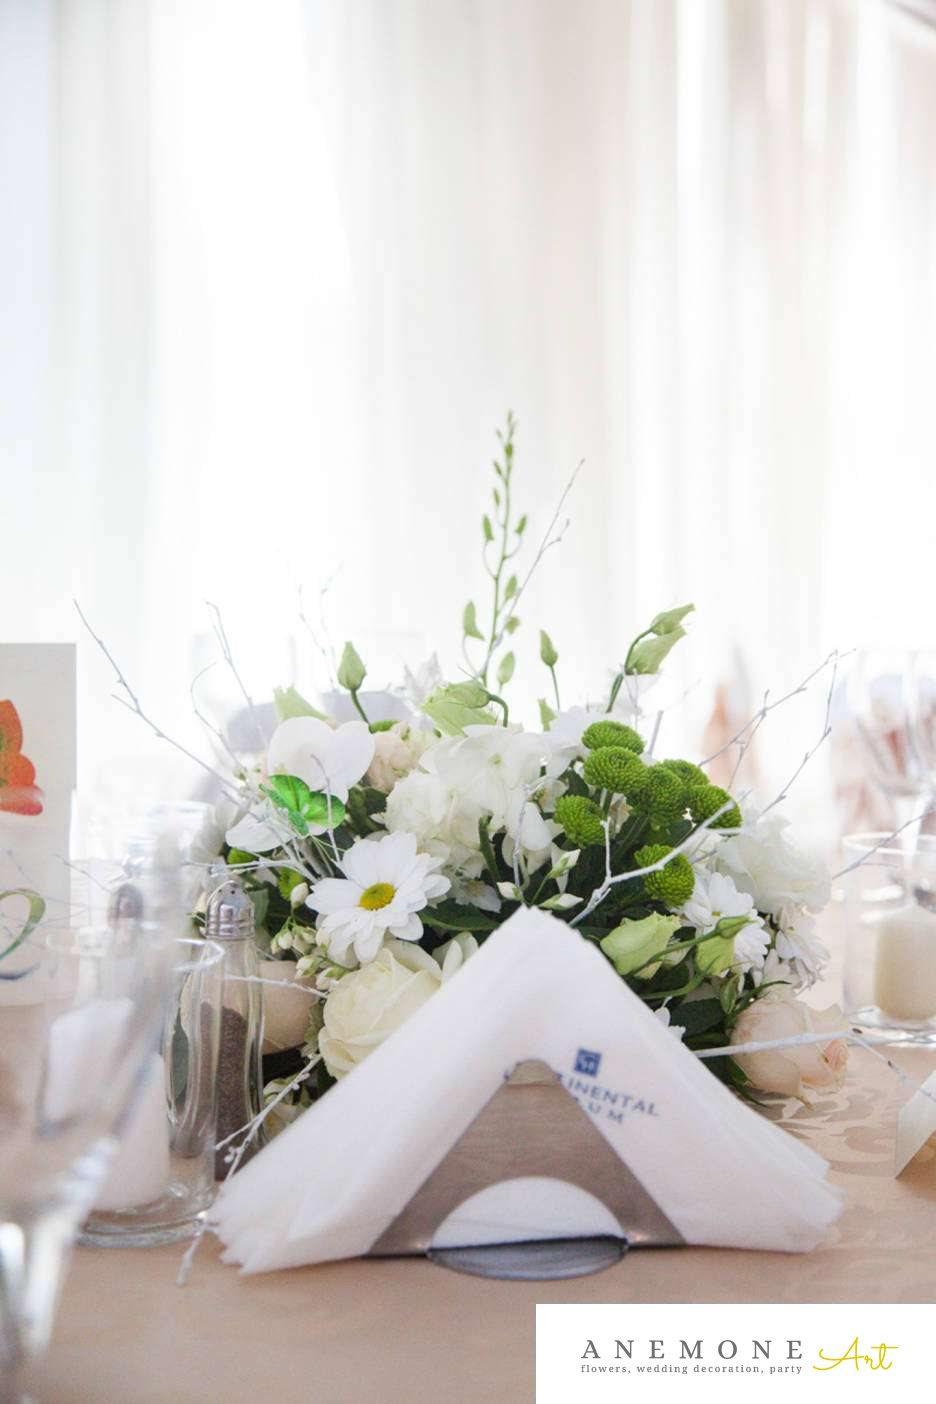 Poza, foto cu Flori de nunta alb, crengi, crizanteme, decor masa, hotel continental, orhidee, trandafiri, verde in Arad, Timisoara, Oradea (wedding flowers, bouquets) nunta Arad, Timisoara, Oradea